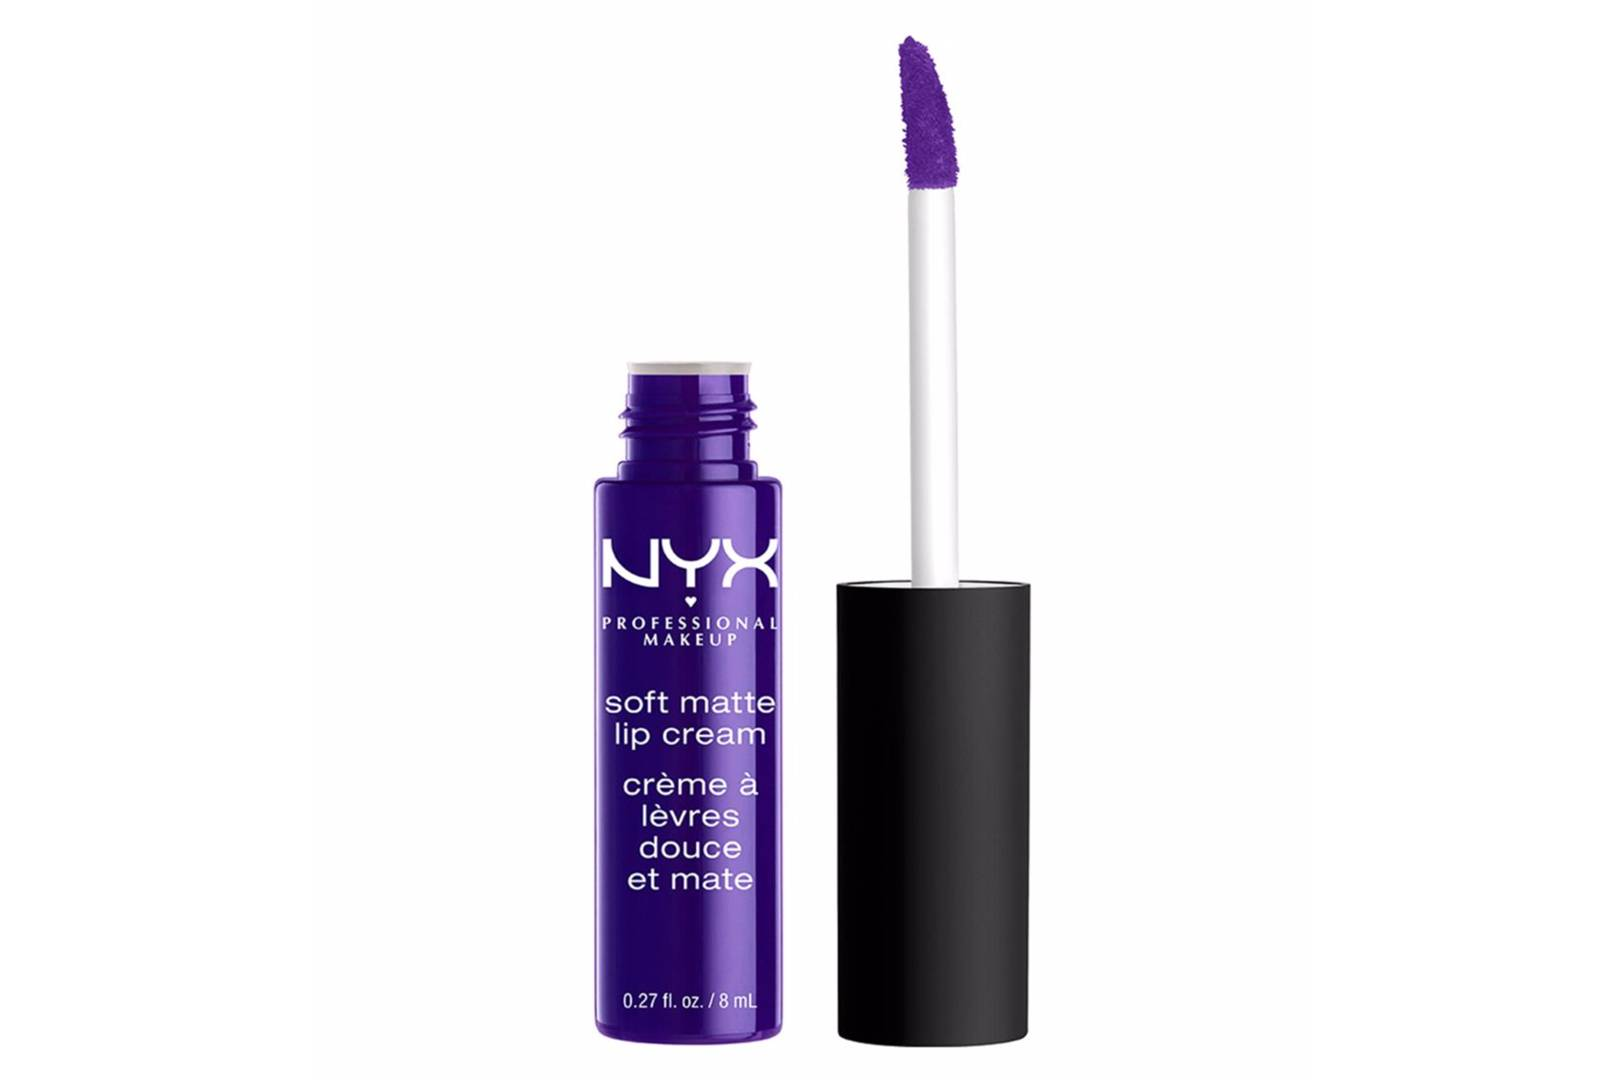 Milani Amore Matte Lip Creme Allure 6gr Daftar Harga Terlengkap Moko Sweet Nude Metal Lipstick Trends 2017 Glitter Lips Kits Marbled Glamour Uk